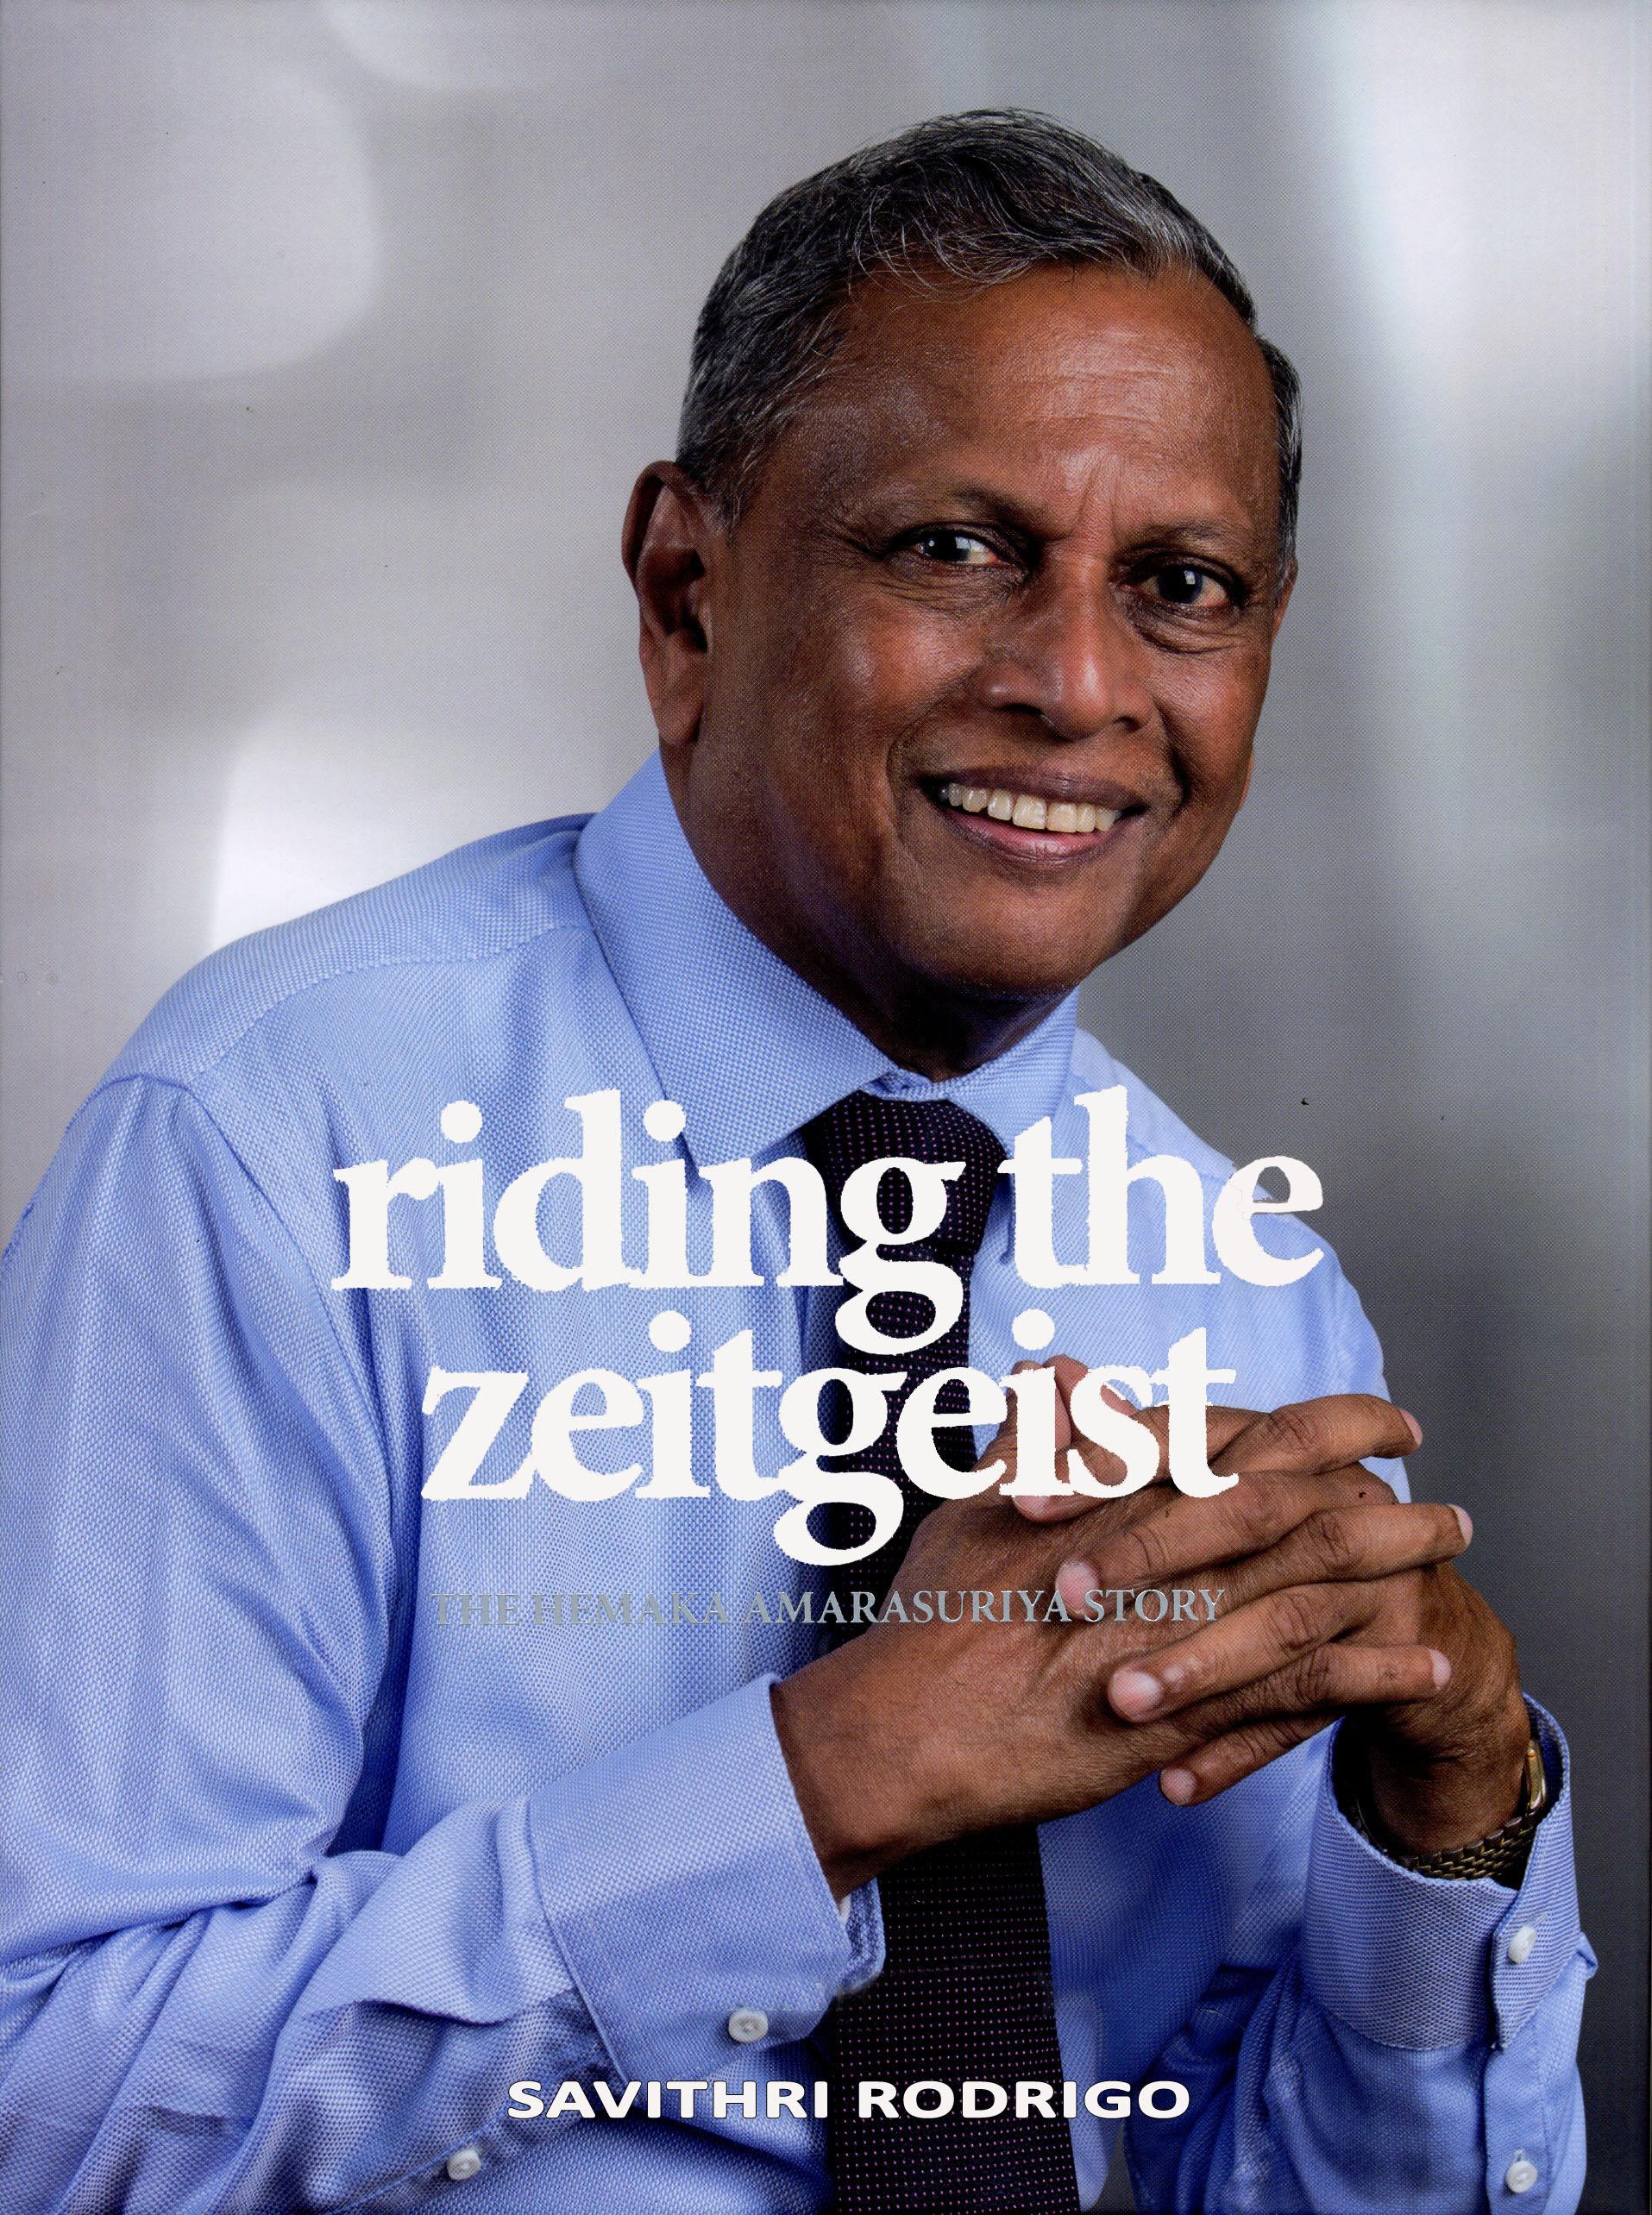 Riding the Zeitgeist